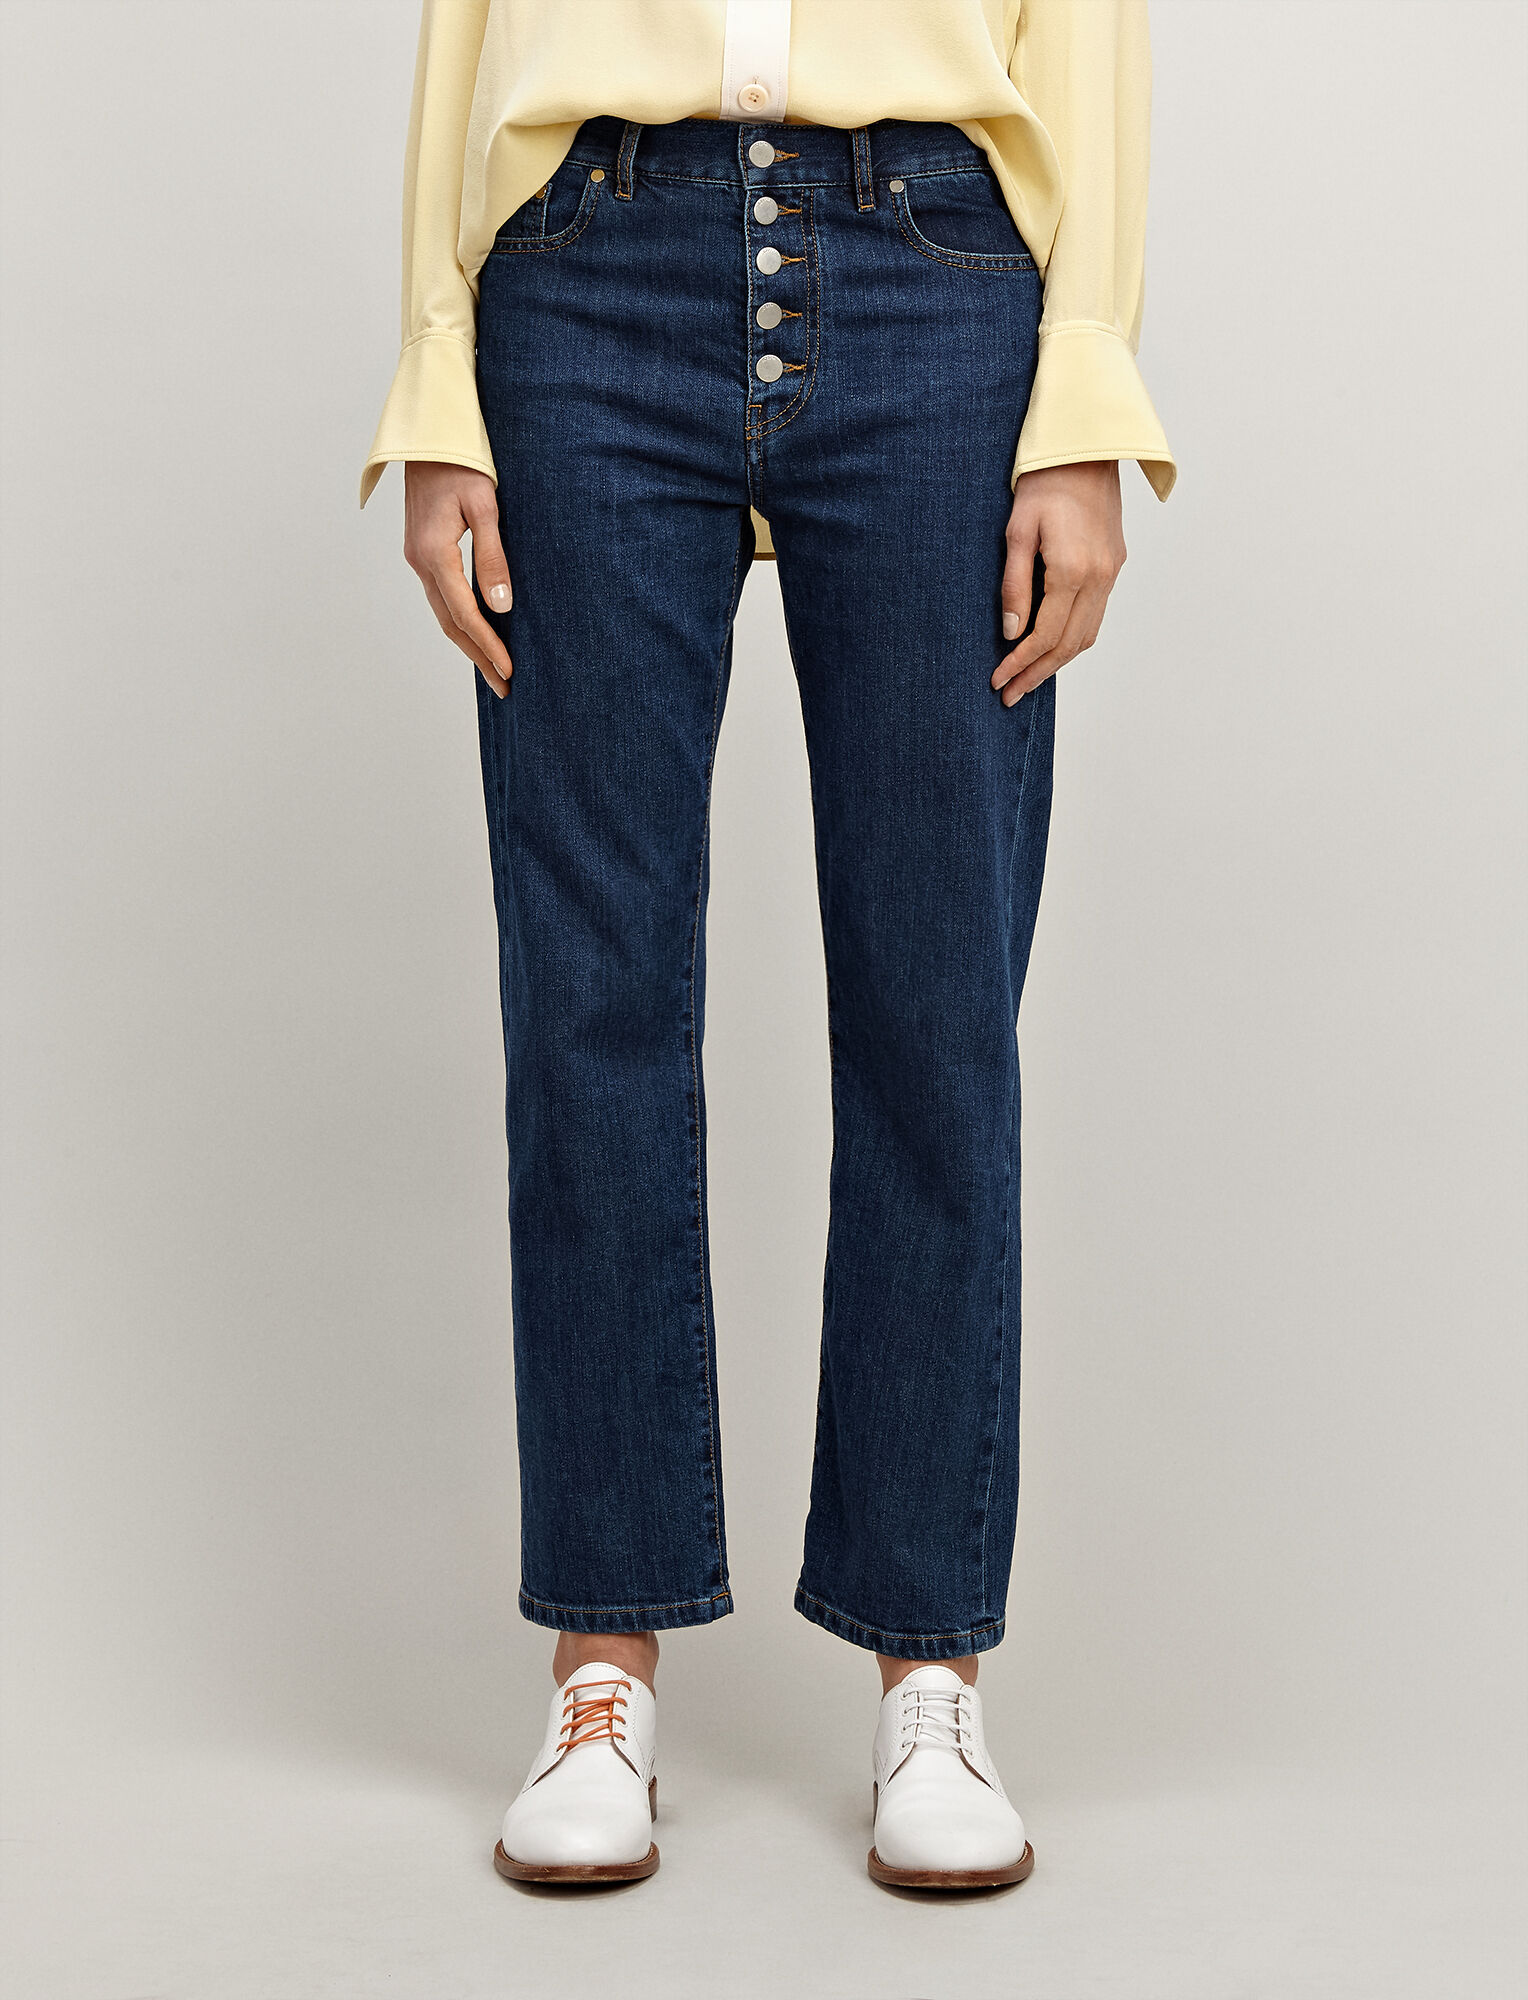 Reliable Cheap Online DENIM - Denim trousers Joseph Very Cheap For Sale Outlet Buy JTEUuqaN